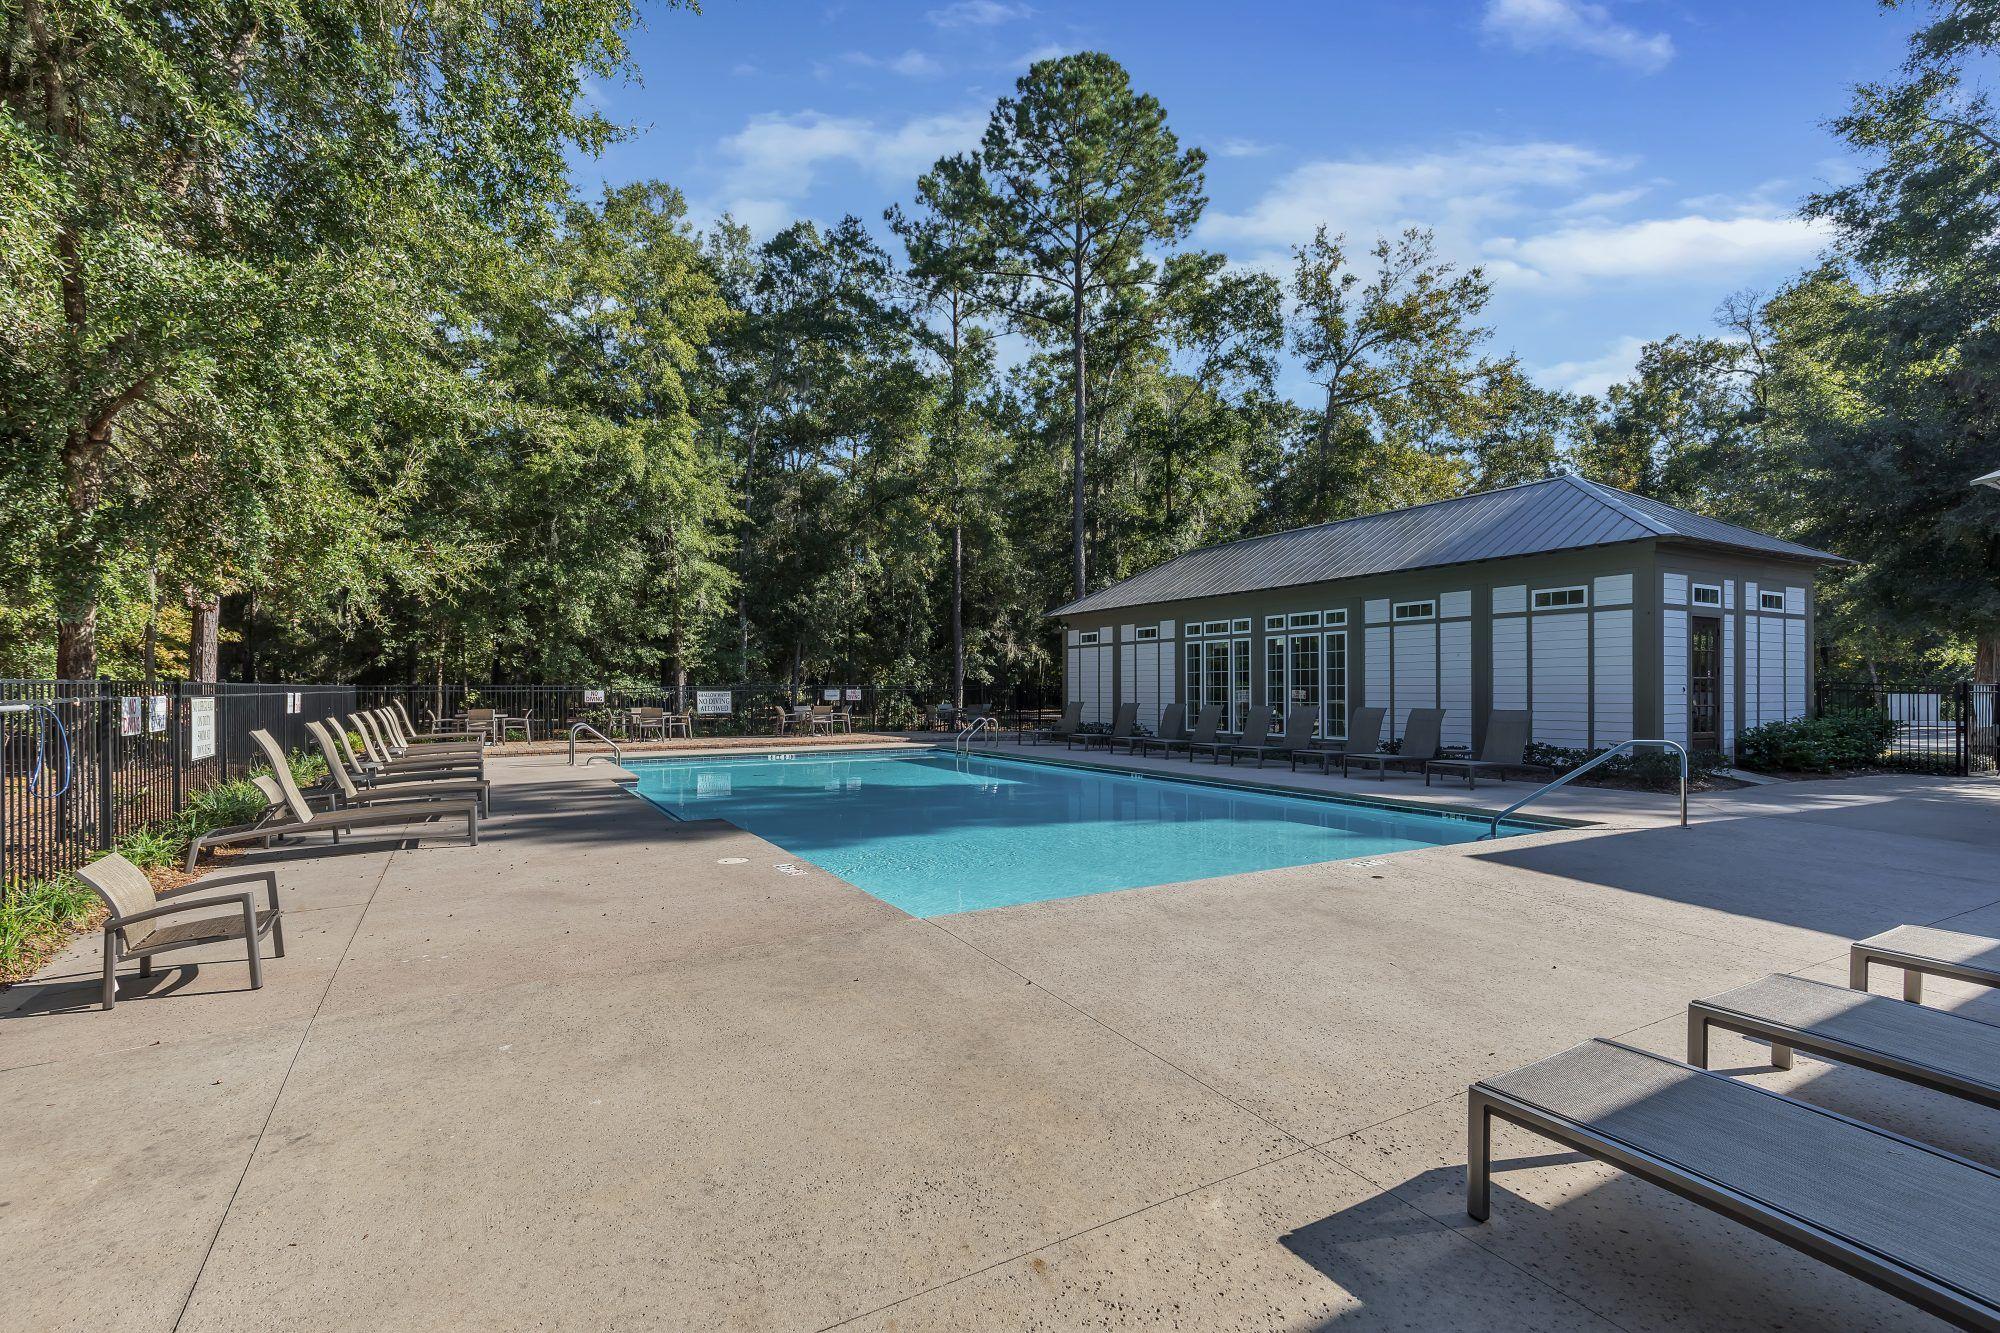 'Waterways - Village Center Townhomes' by Savannah in Savannah